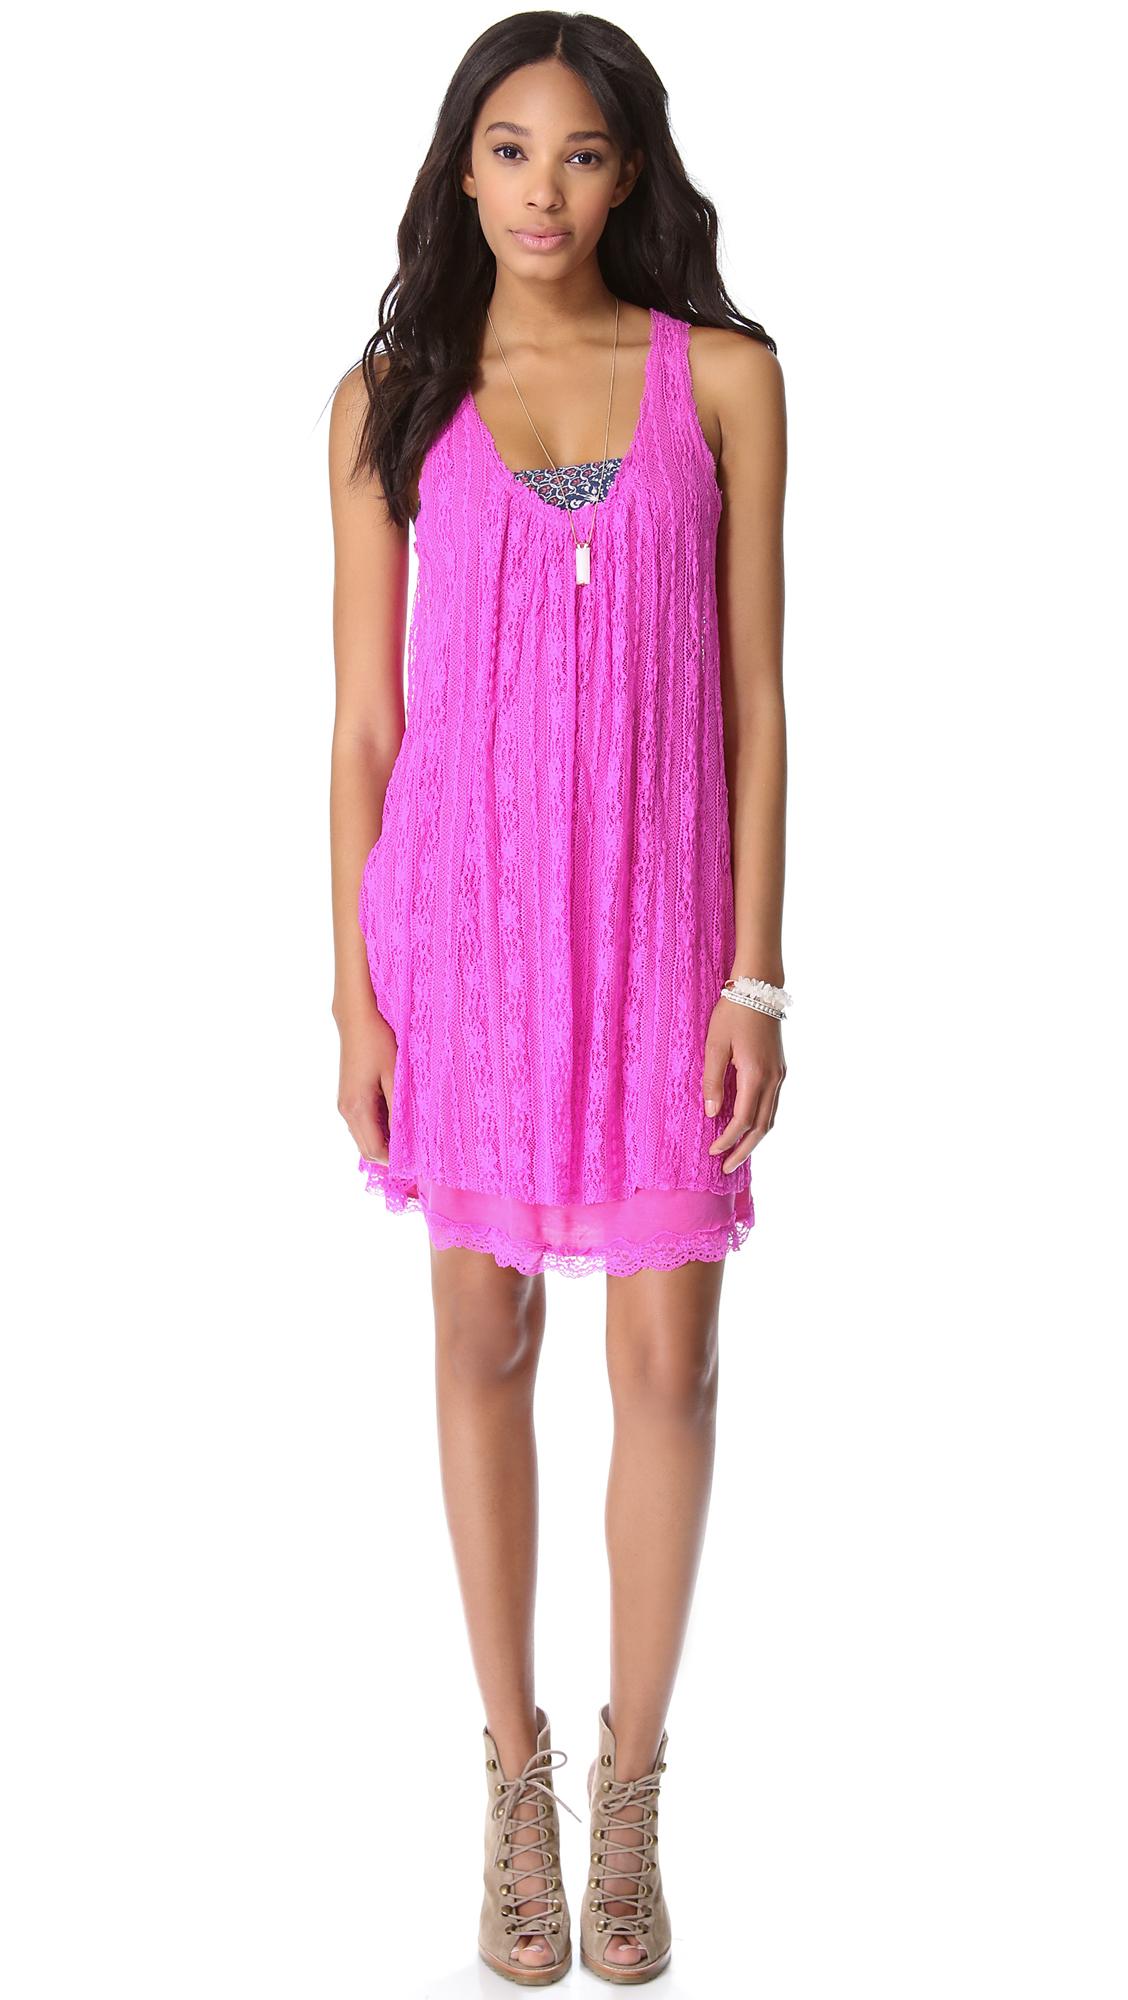 Free People Lace Swing Dress In Pink Lyst